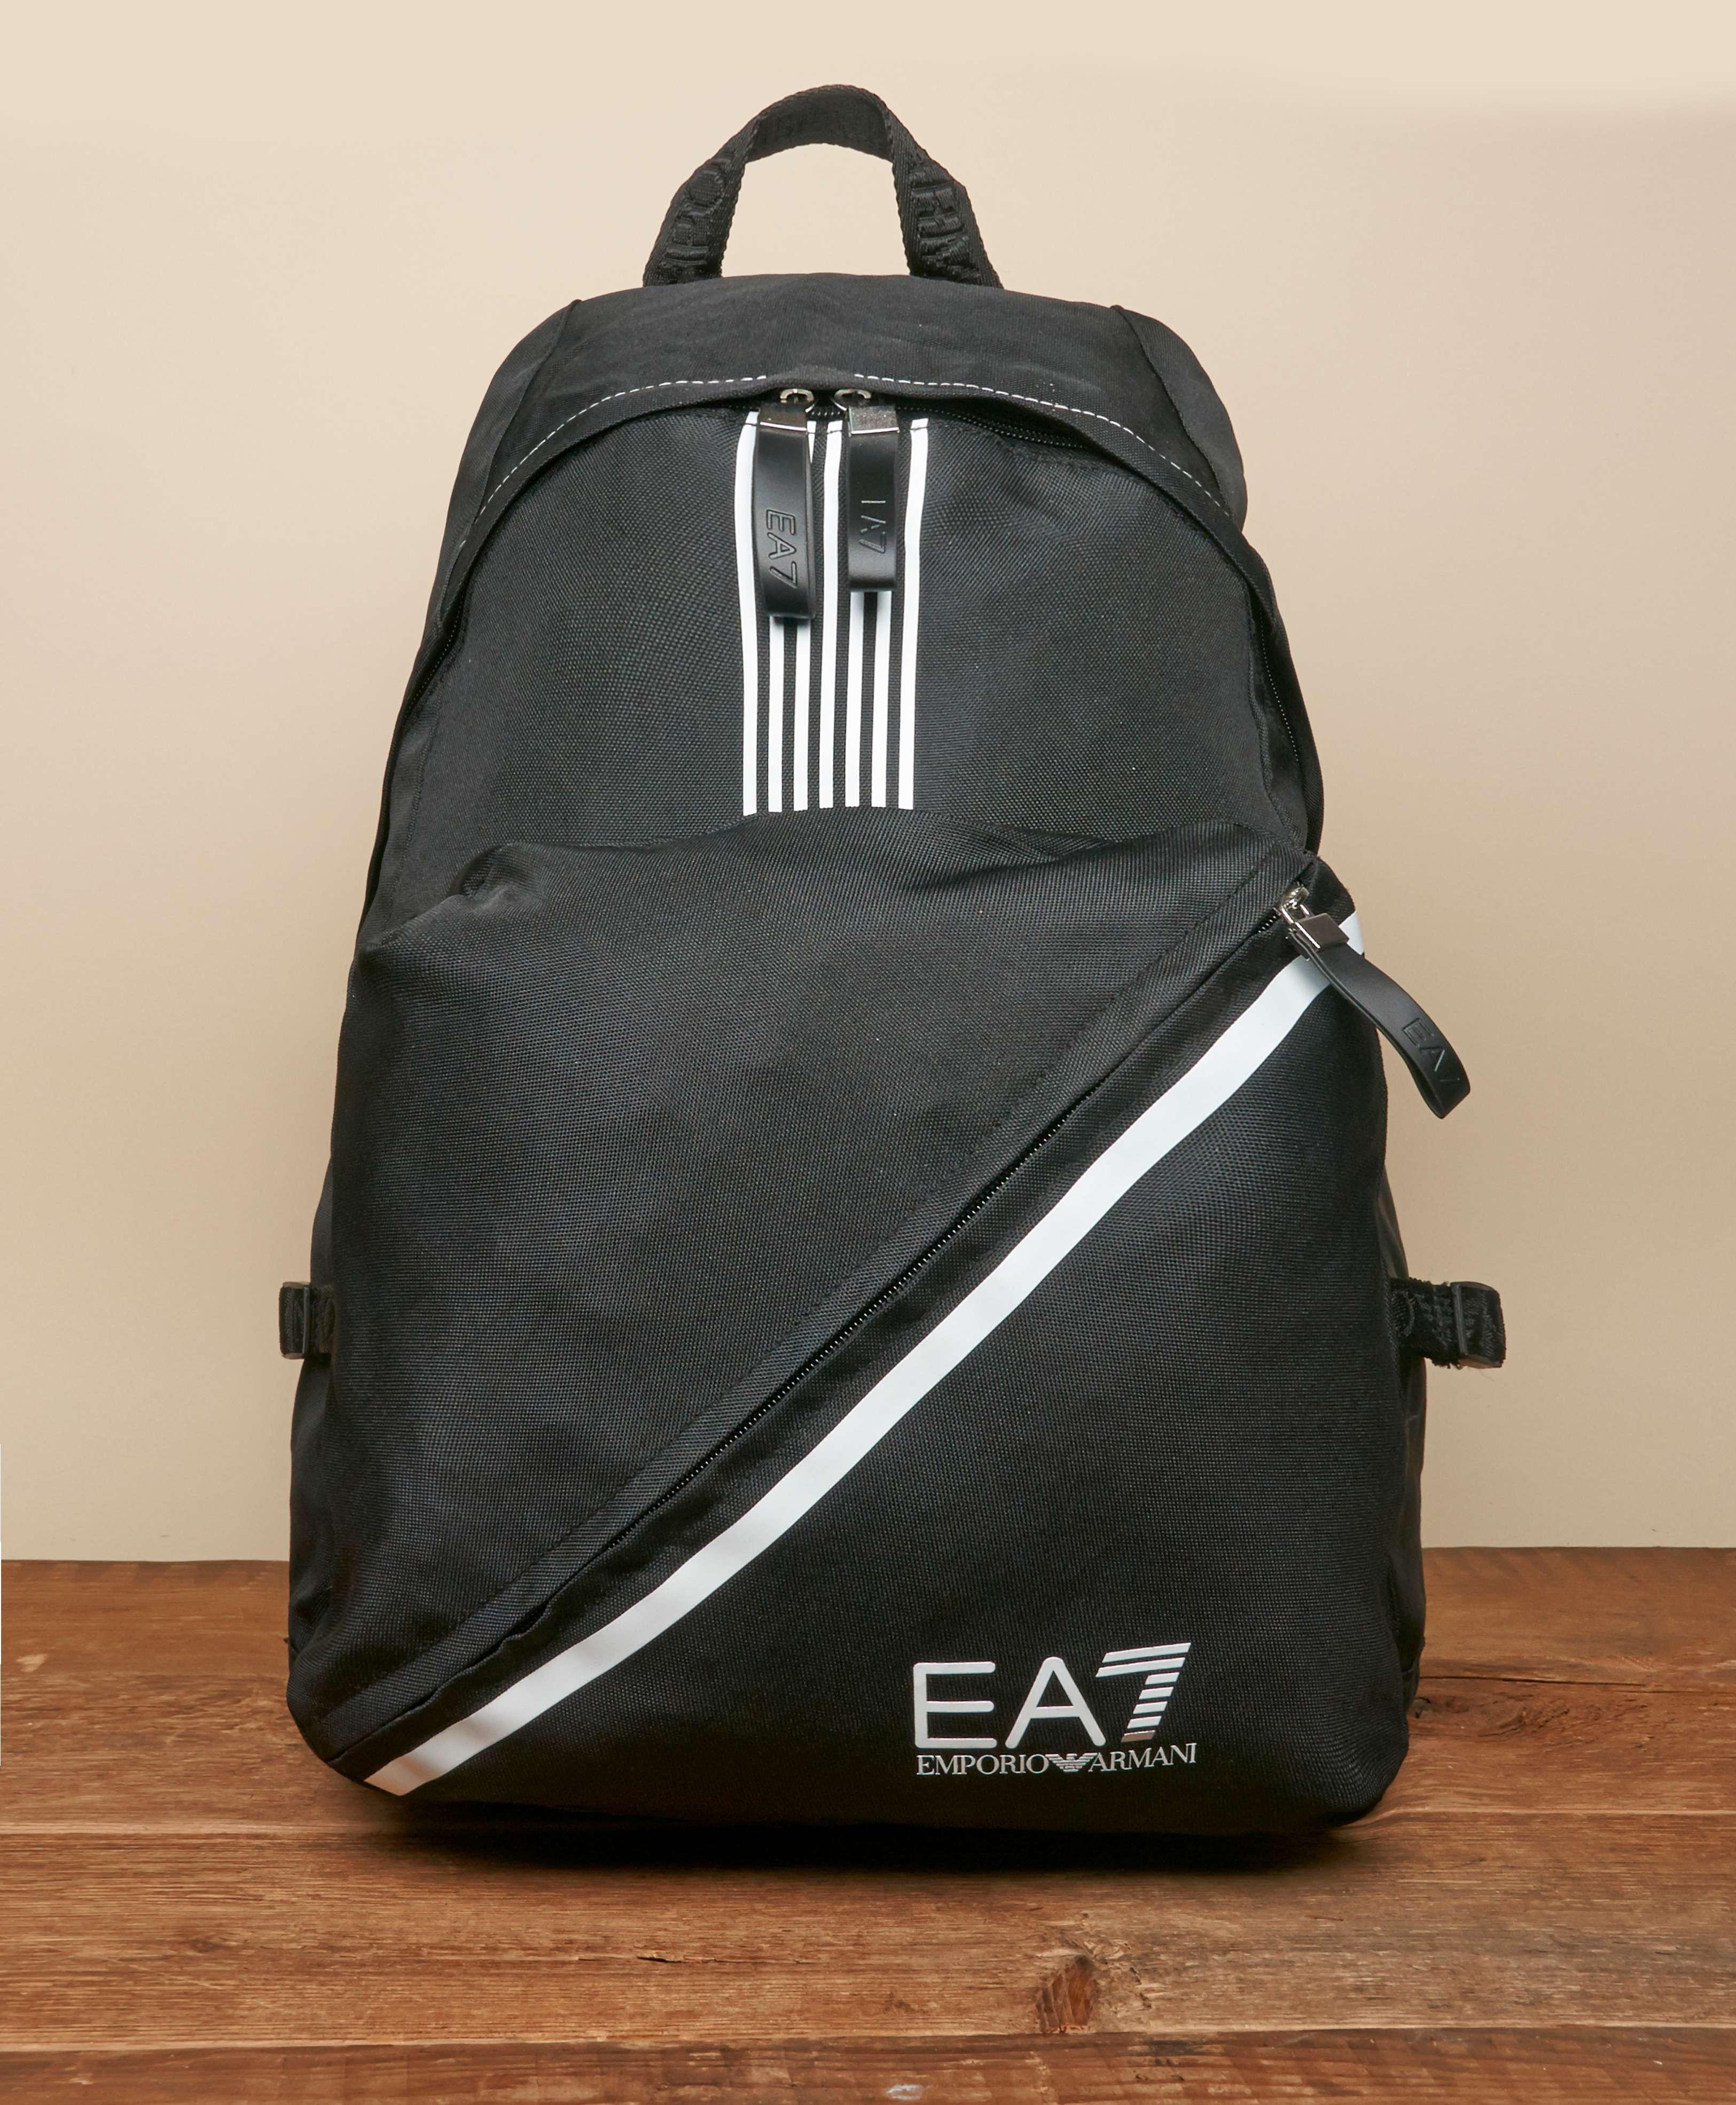 3344fc50304b Emporio Armani EA7 Core Backpack